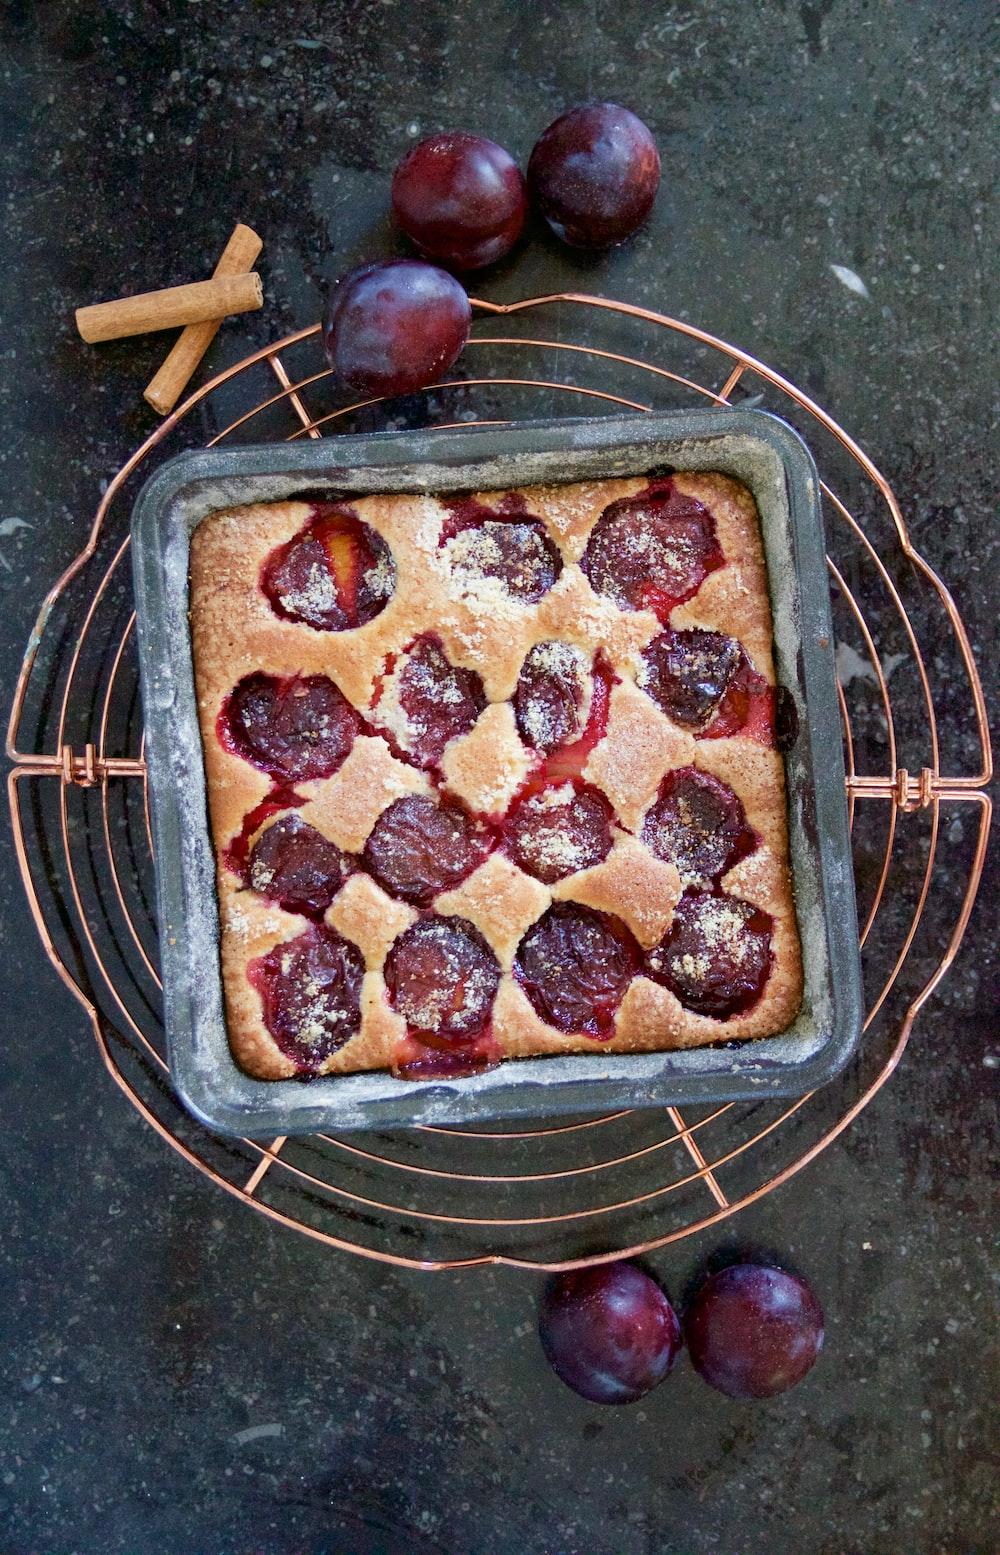 plum fruits and plum pie on black bowl